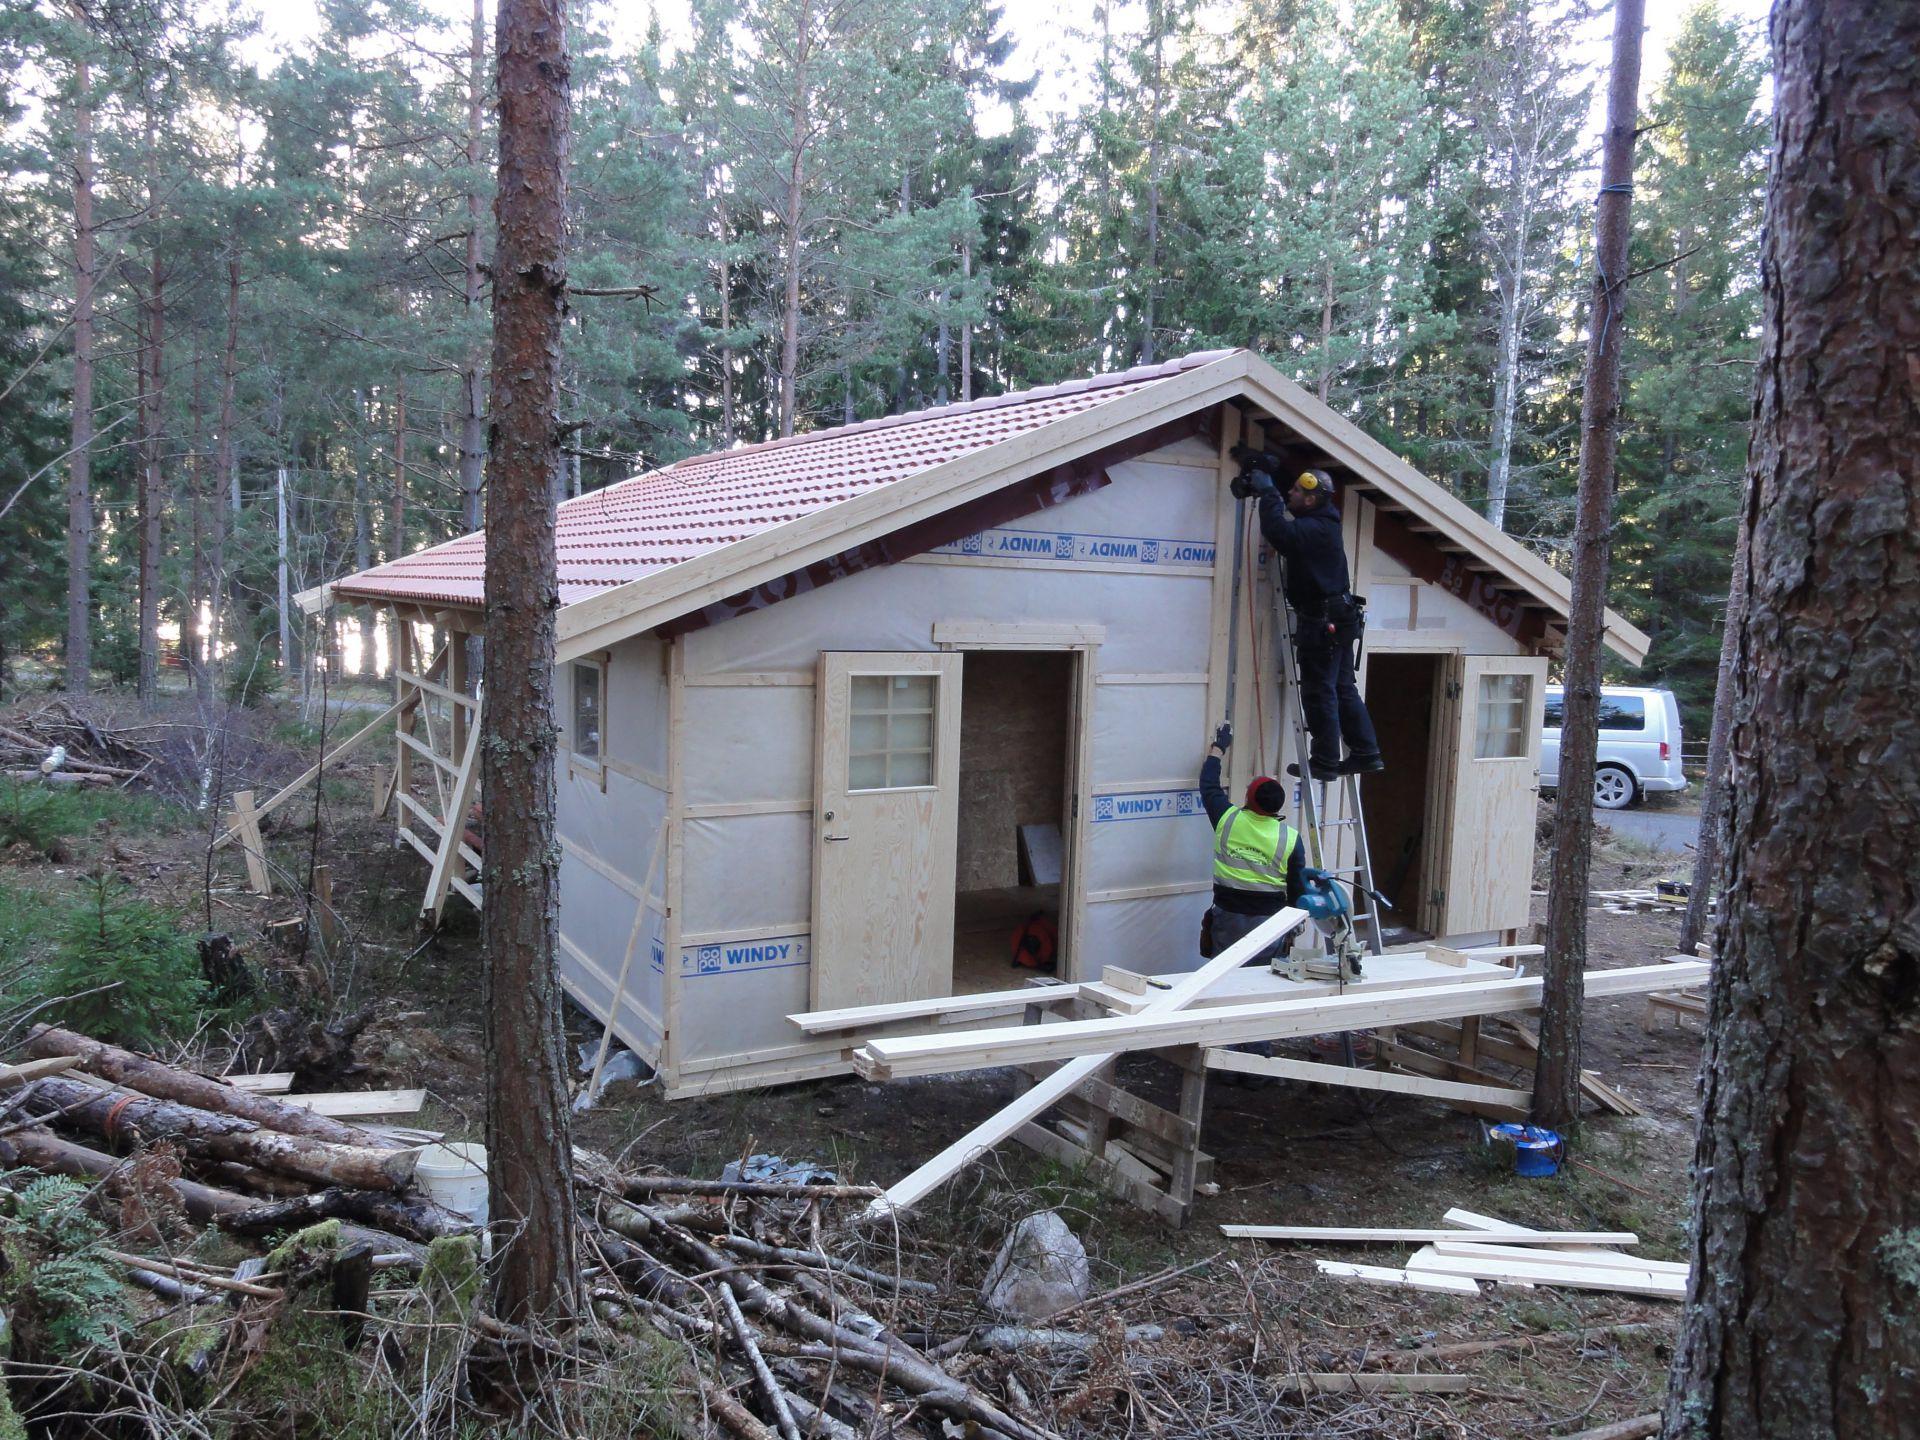 Byggfirma i Södermanland - byggfirma Södermanland